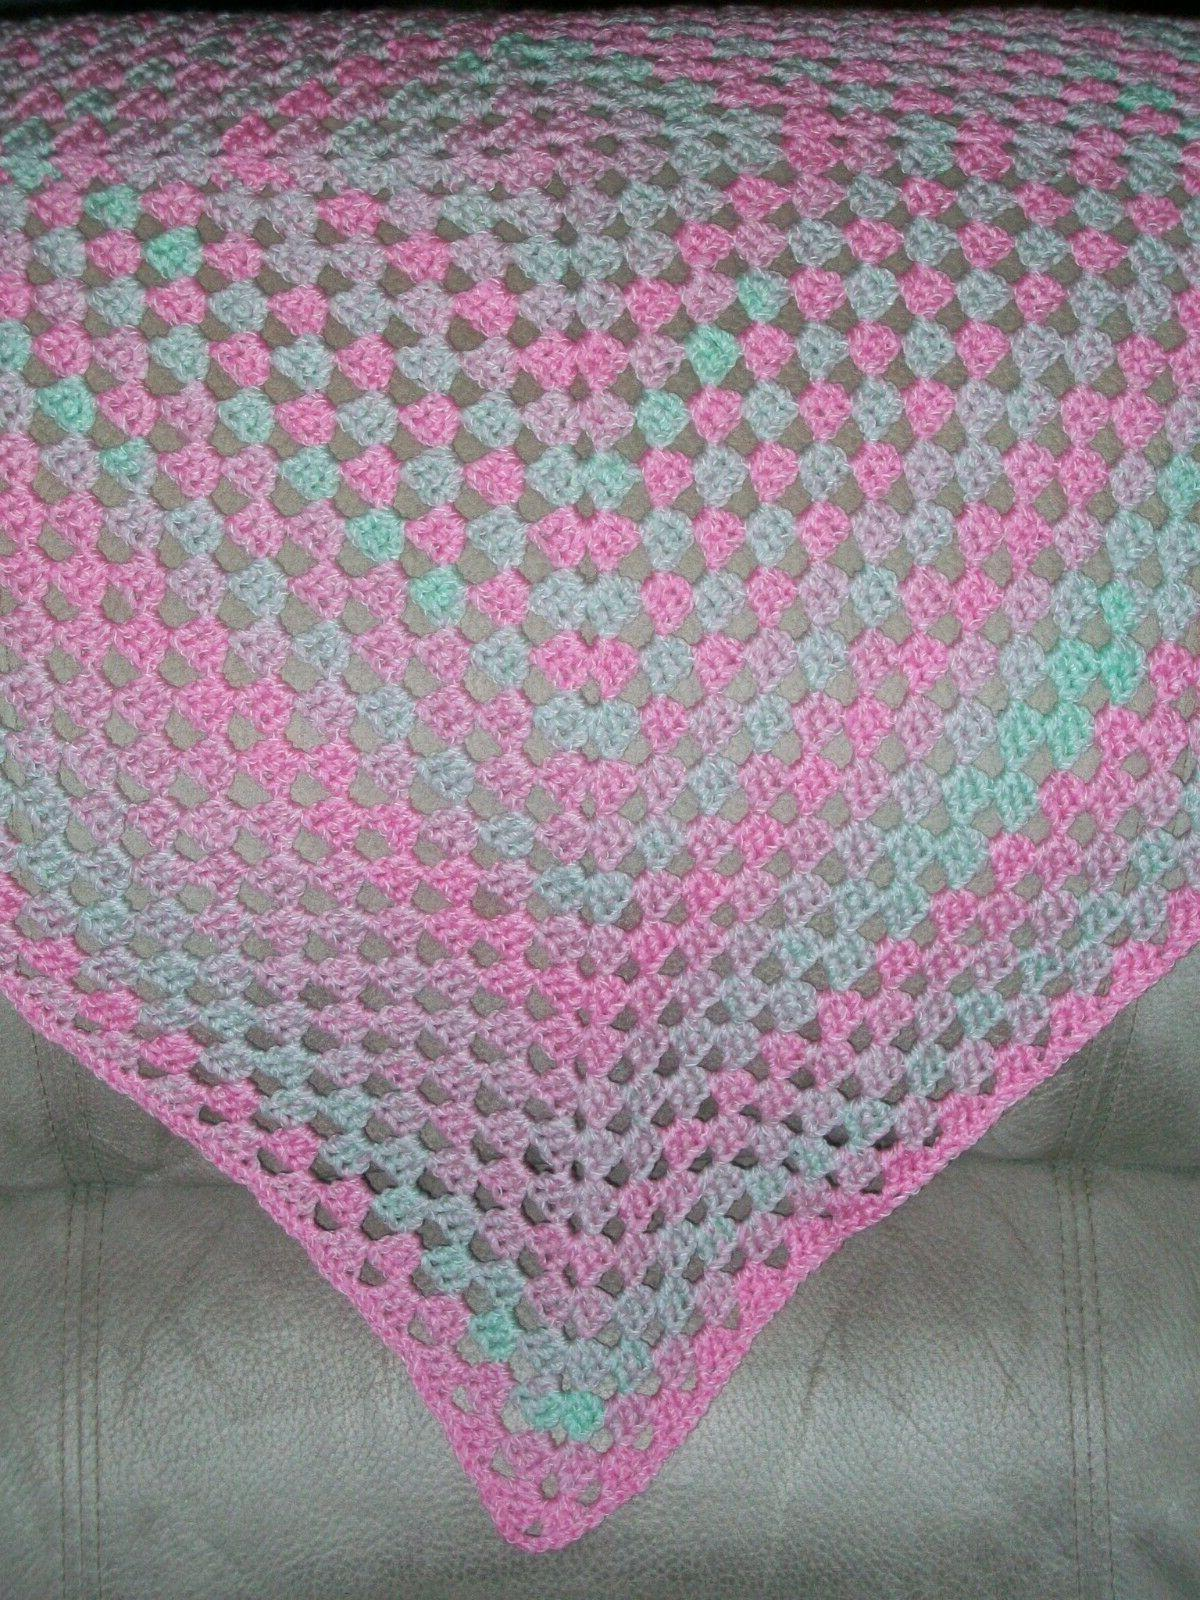 HANDMADE Crochet Baby Blanket Afghan - Nicole Picnic Yarn -